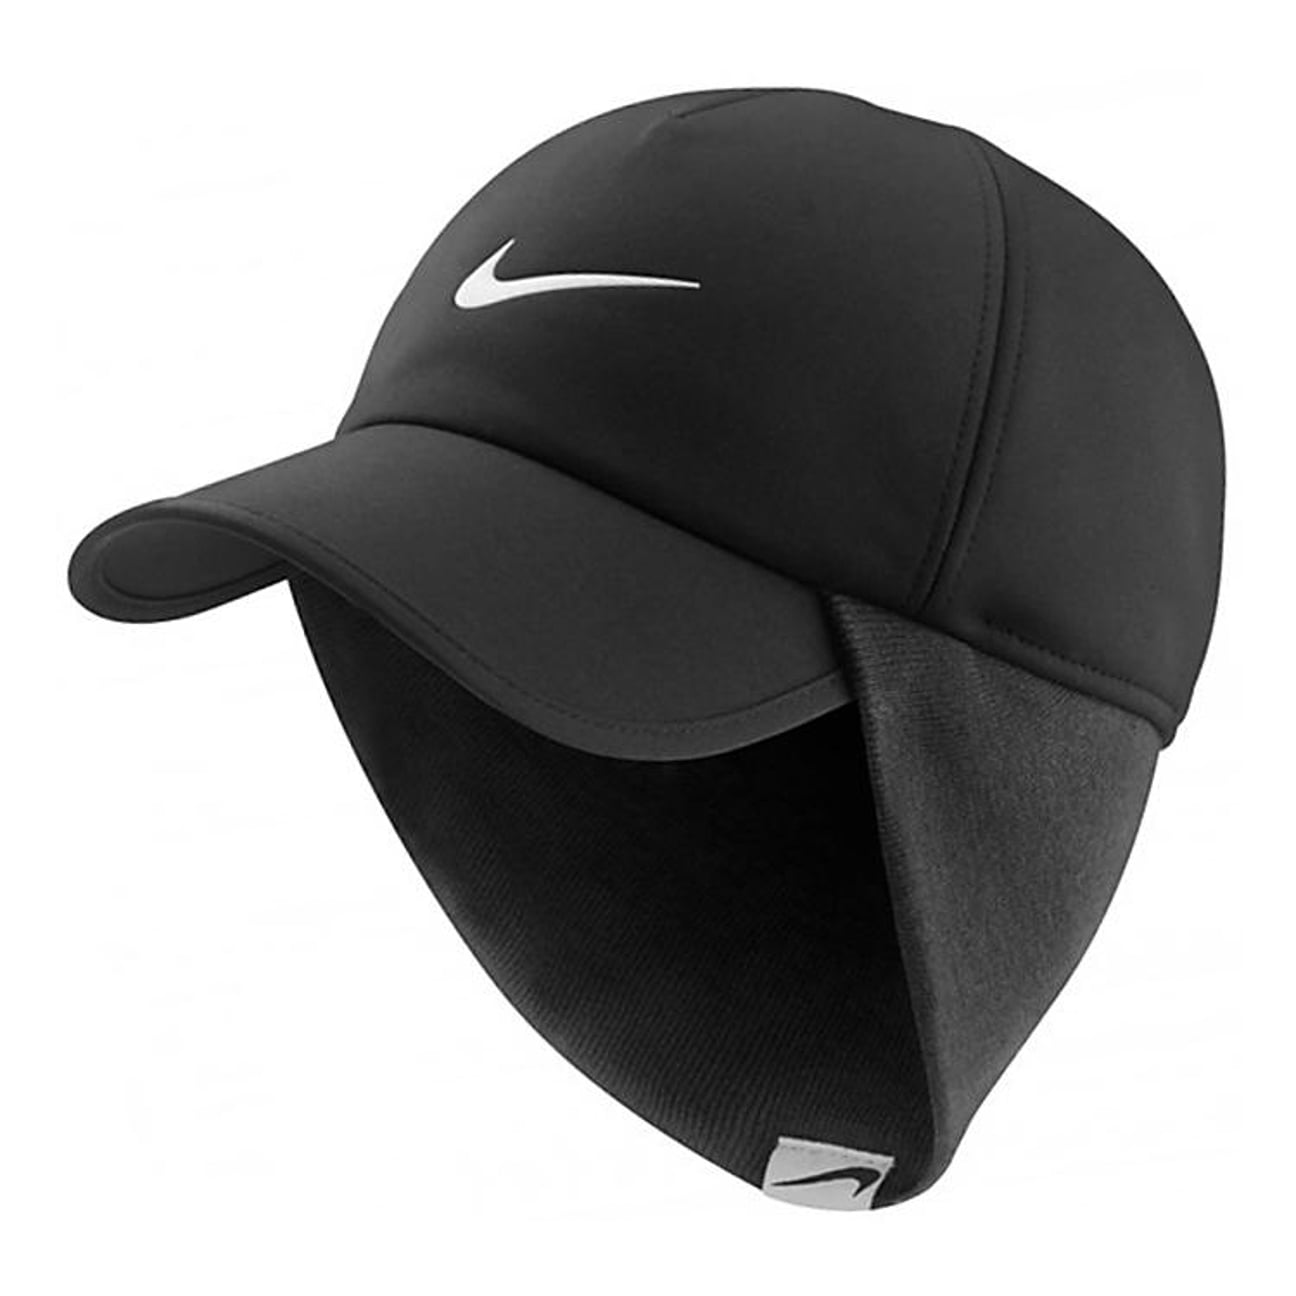 Baseball Cap with Earflaps by Nike - black 1 011321ae7e4